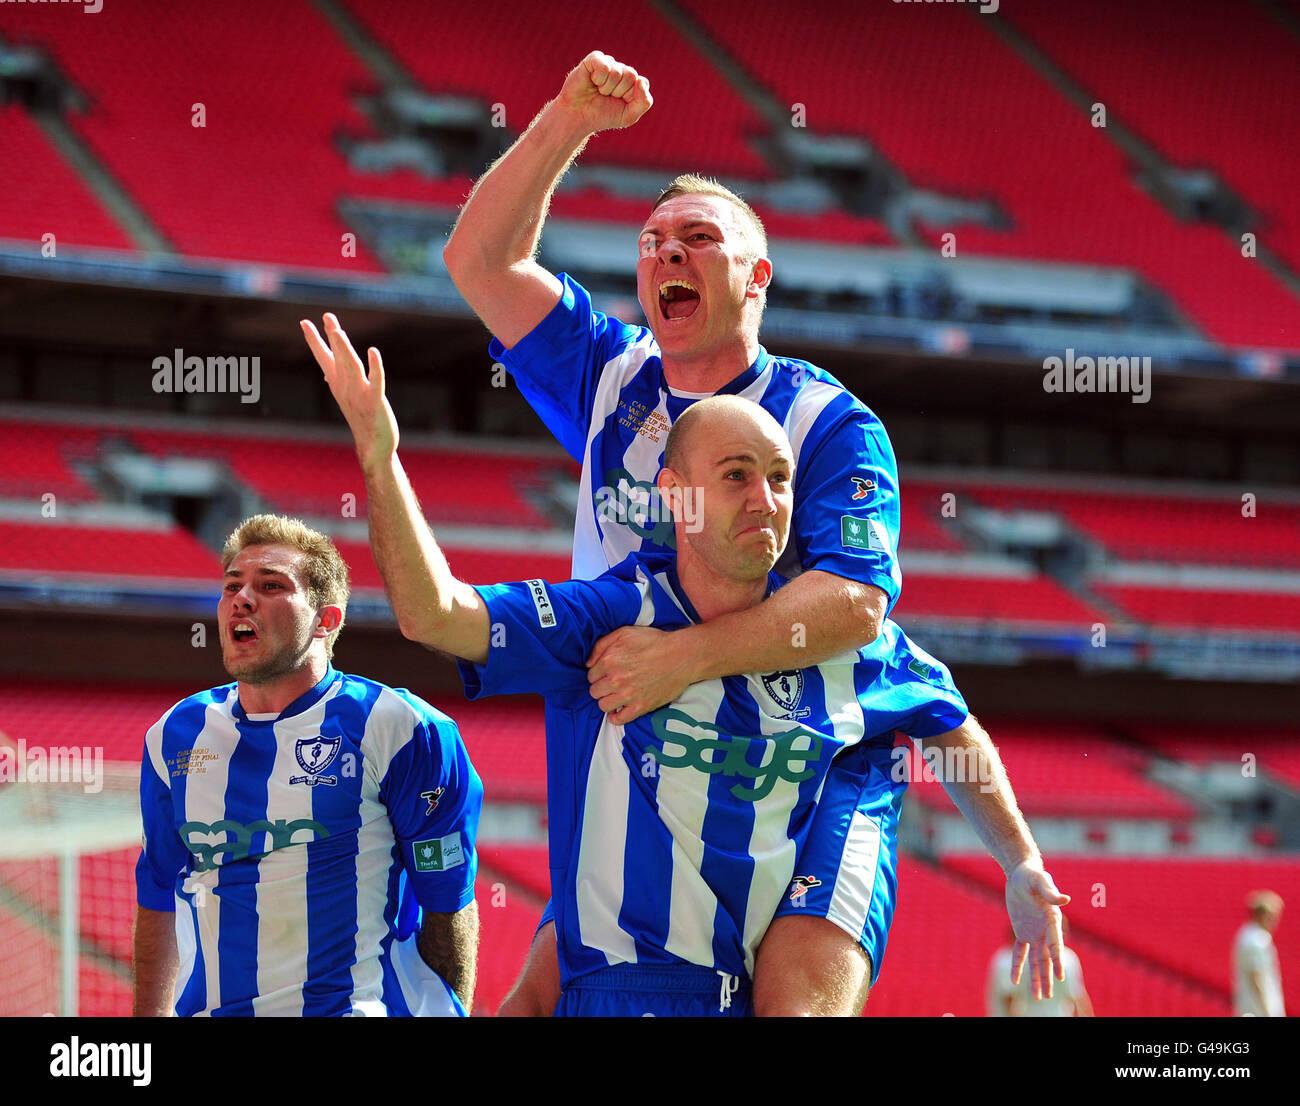 Soccer - The FA Vase Trophy - Final - Coalville Town v Whitley Bay - Wembley Stadium - Stock Image